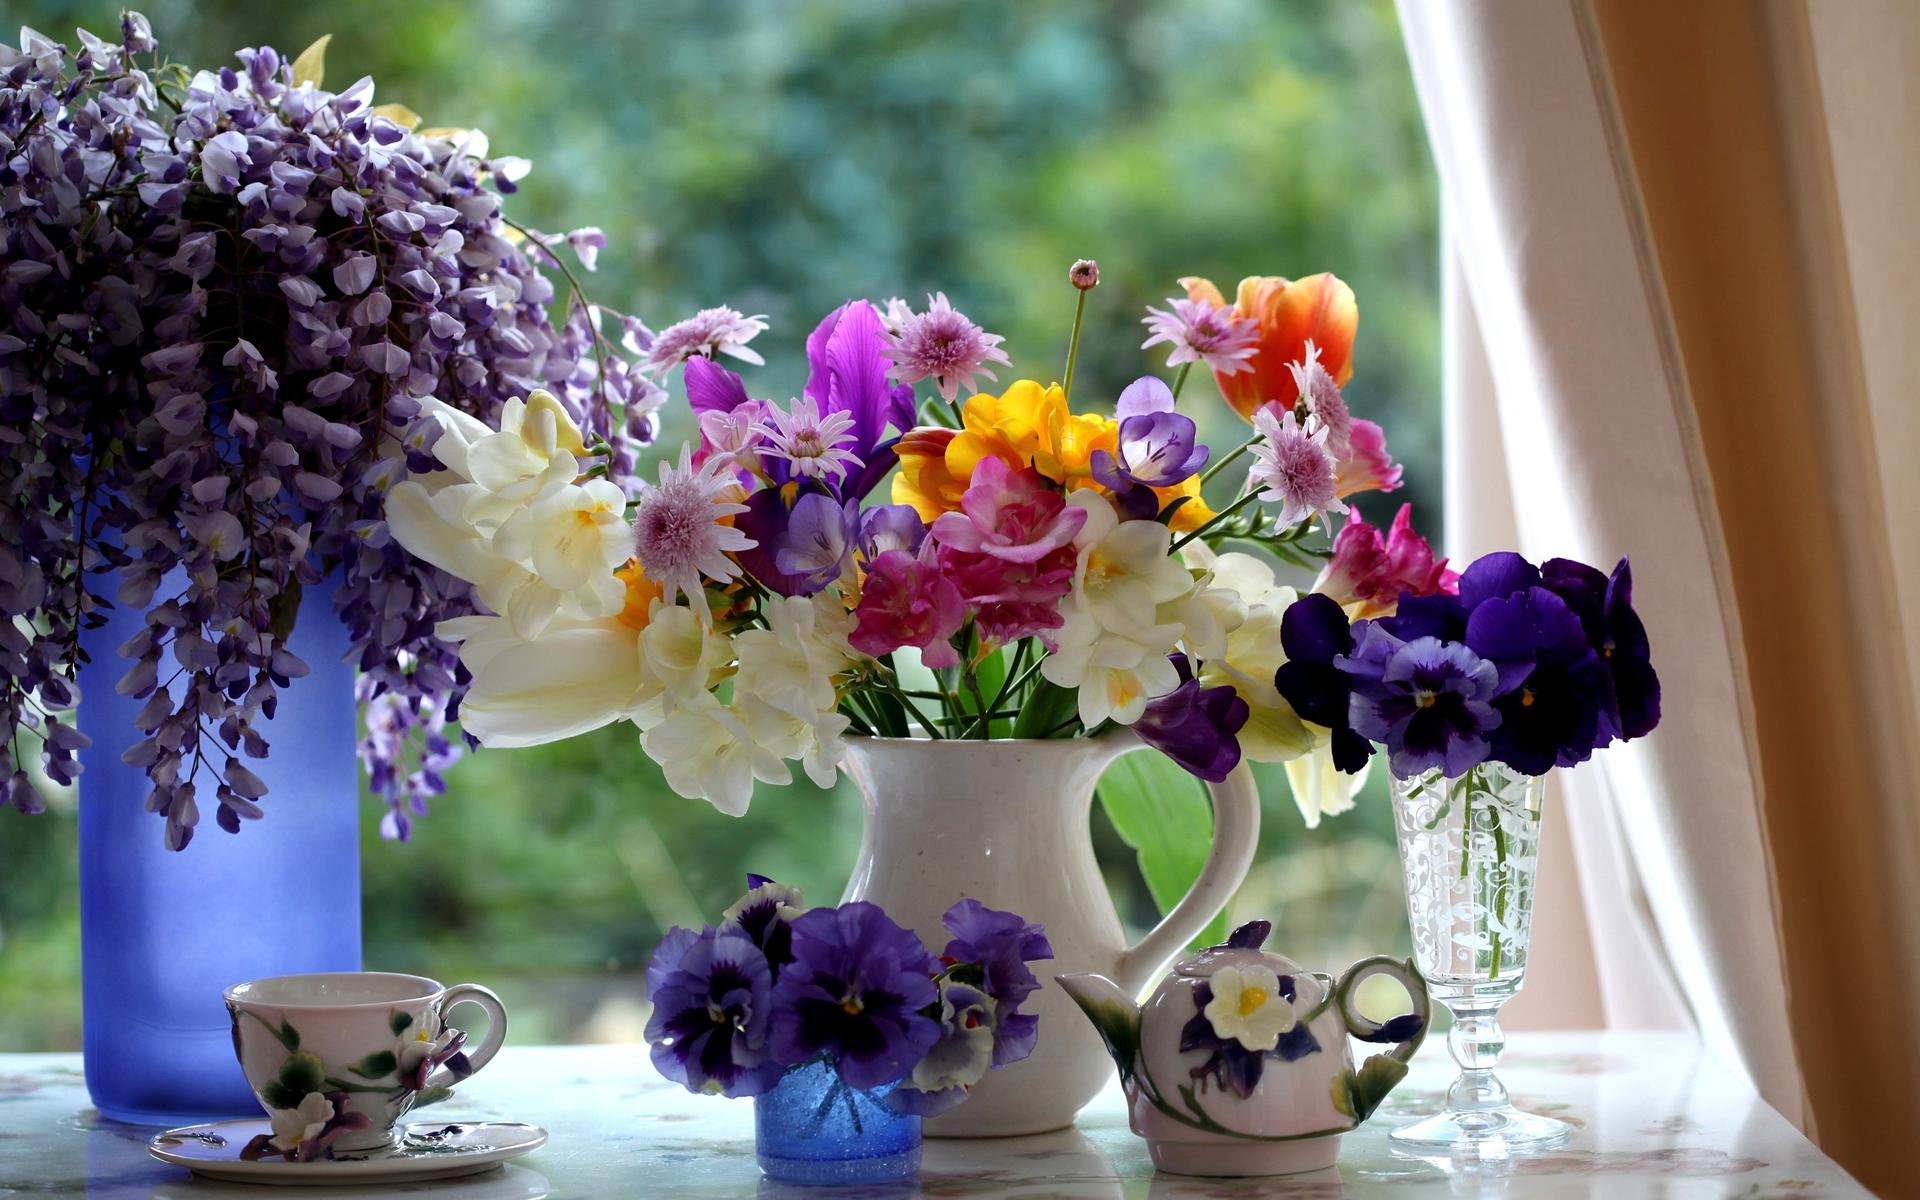 beautiful spring still life by stock photo   Desktop Wallpaper 1920x1200